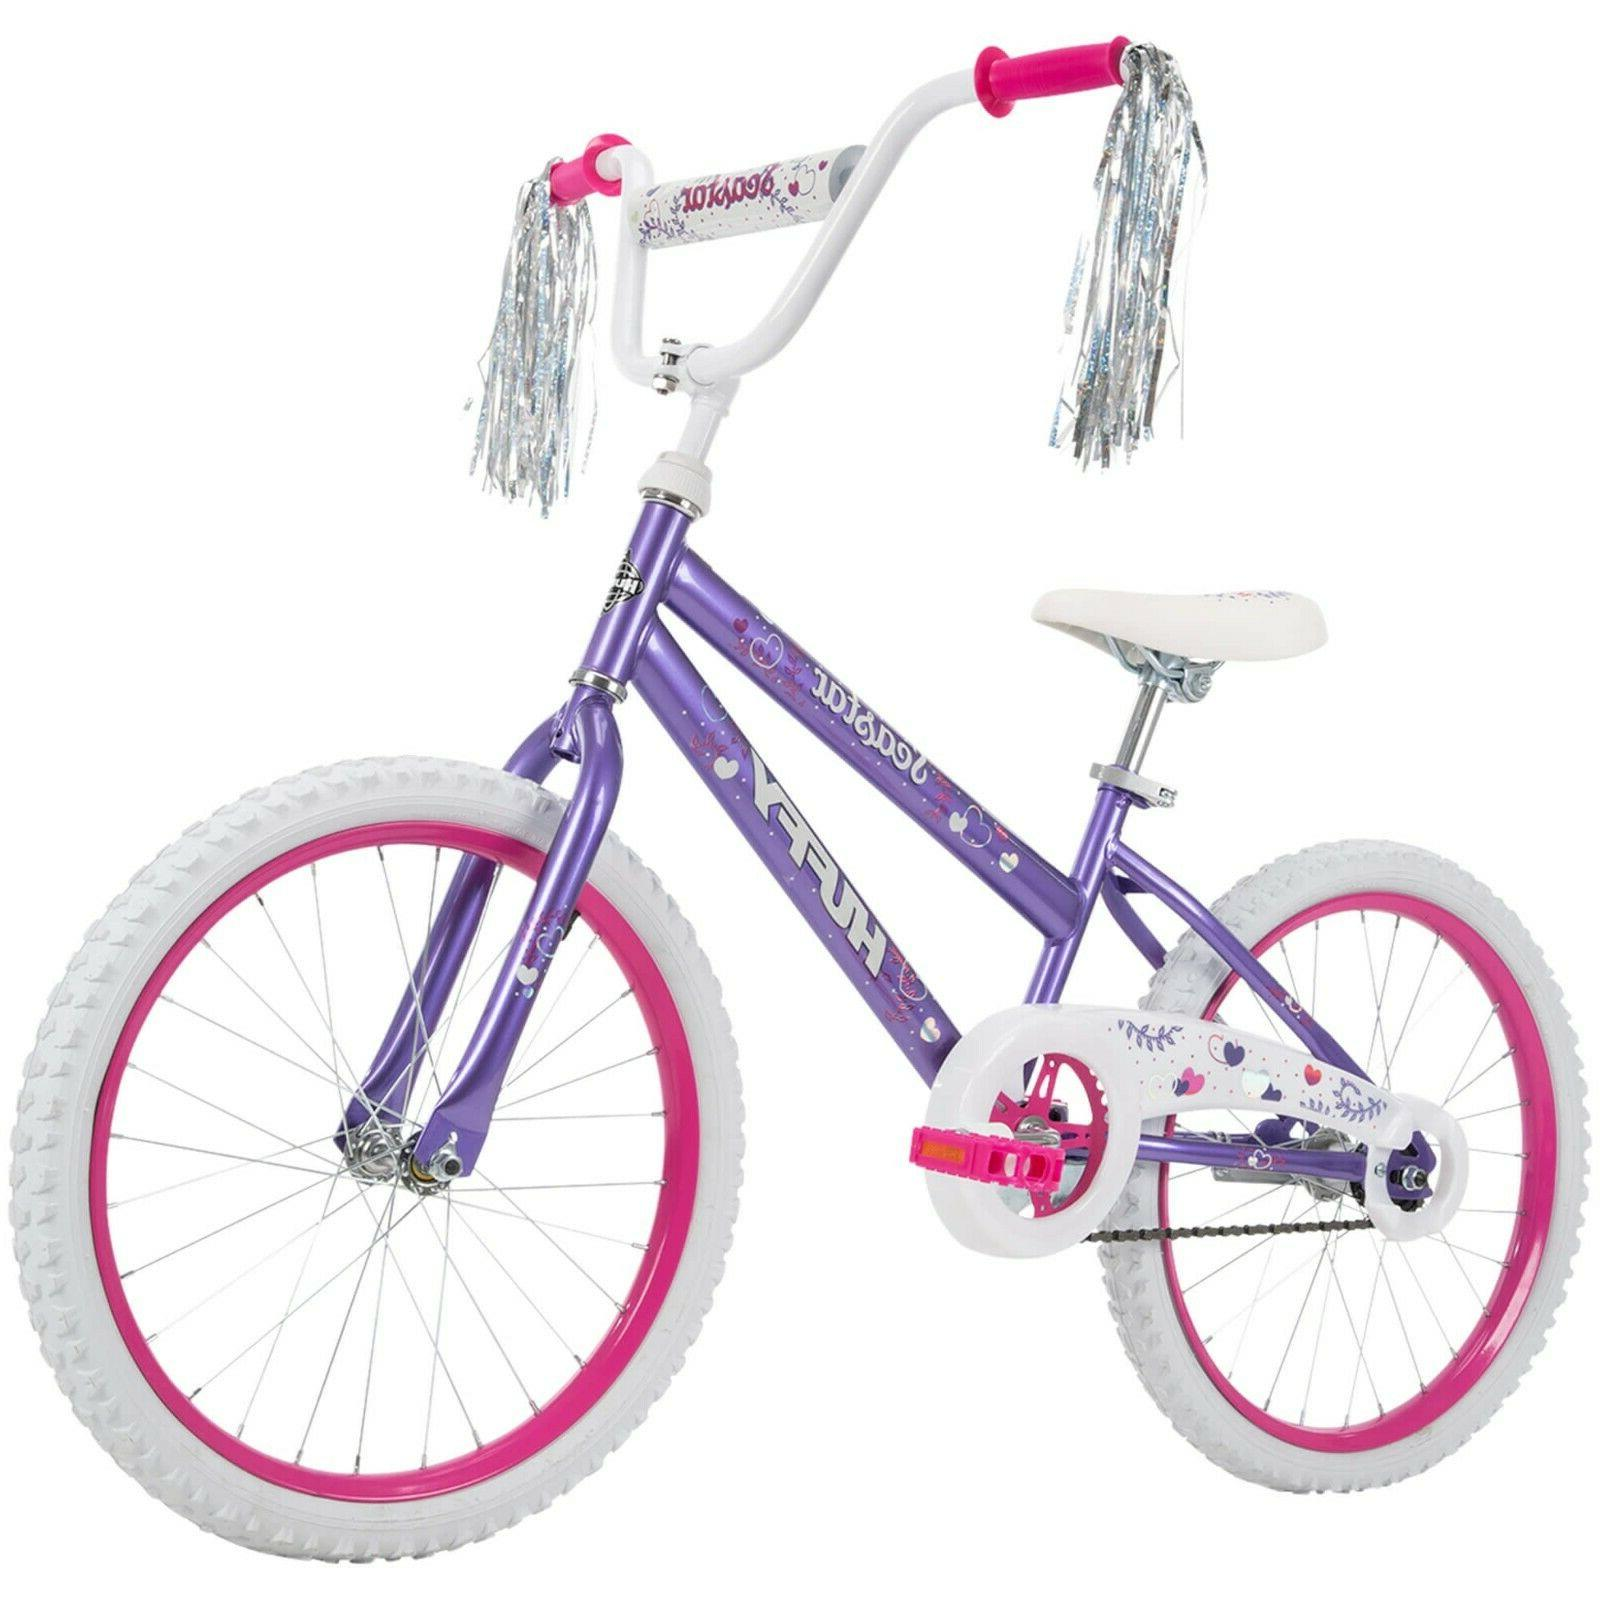 20 sea star girls bike for kids